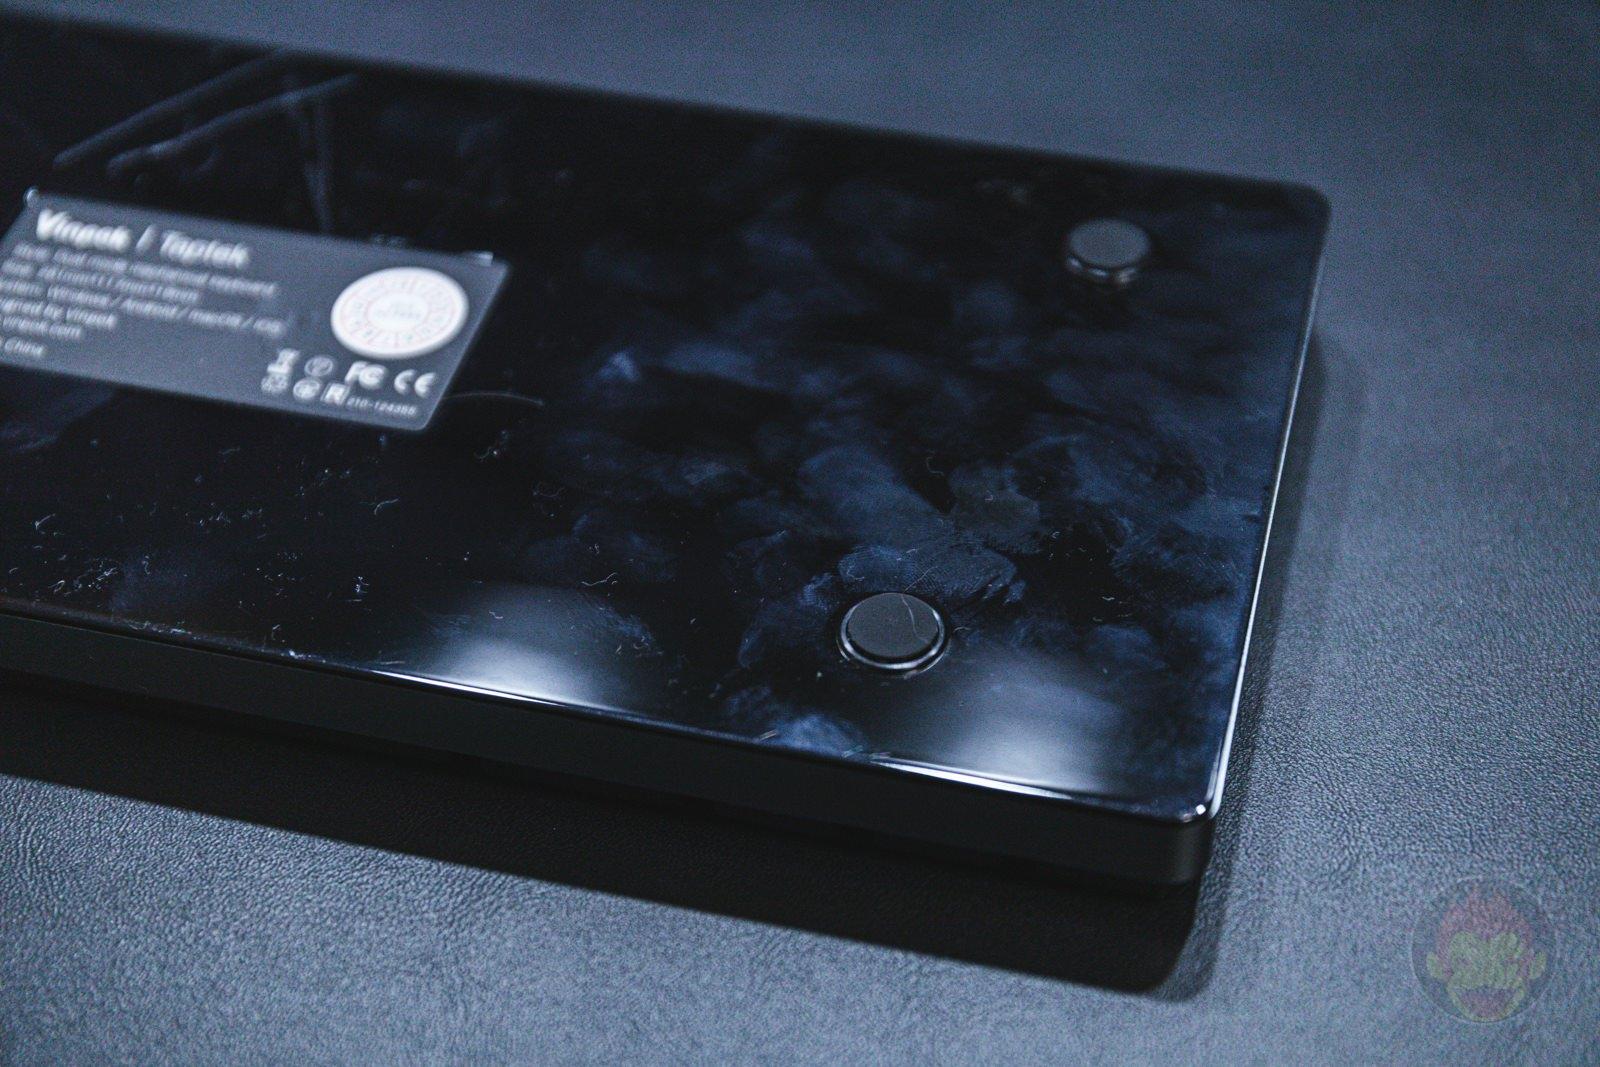 Vinpok-Taptek-Wireless-Keyboard-Review-3-10.jpg